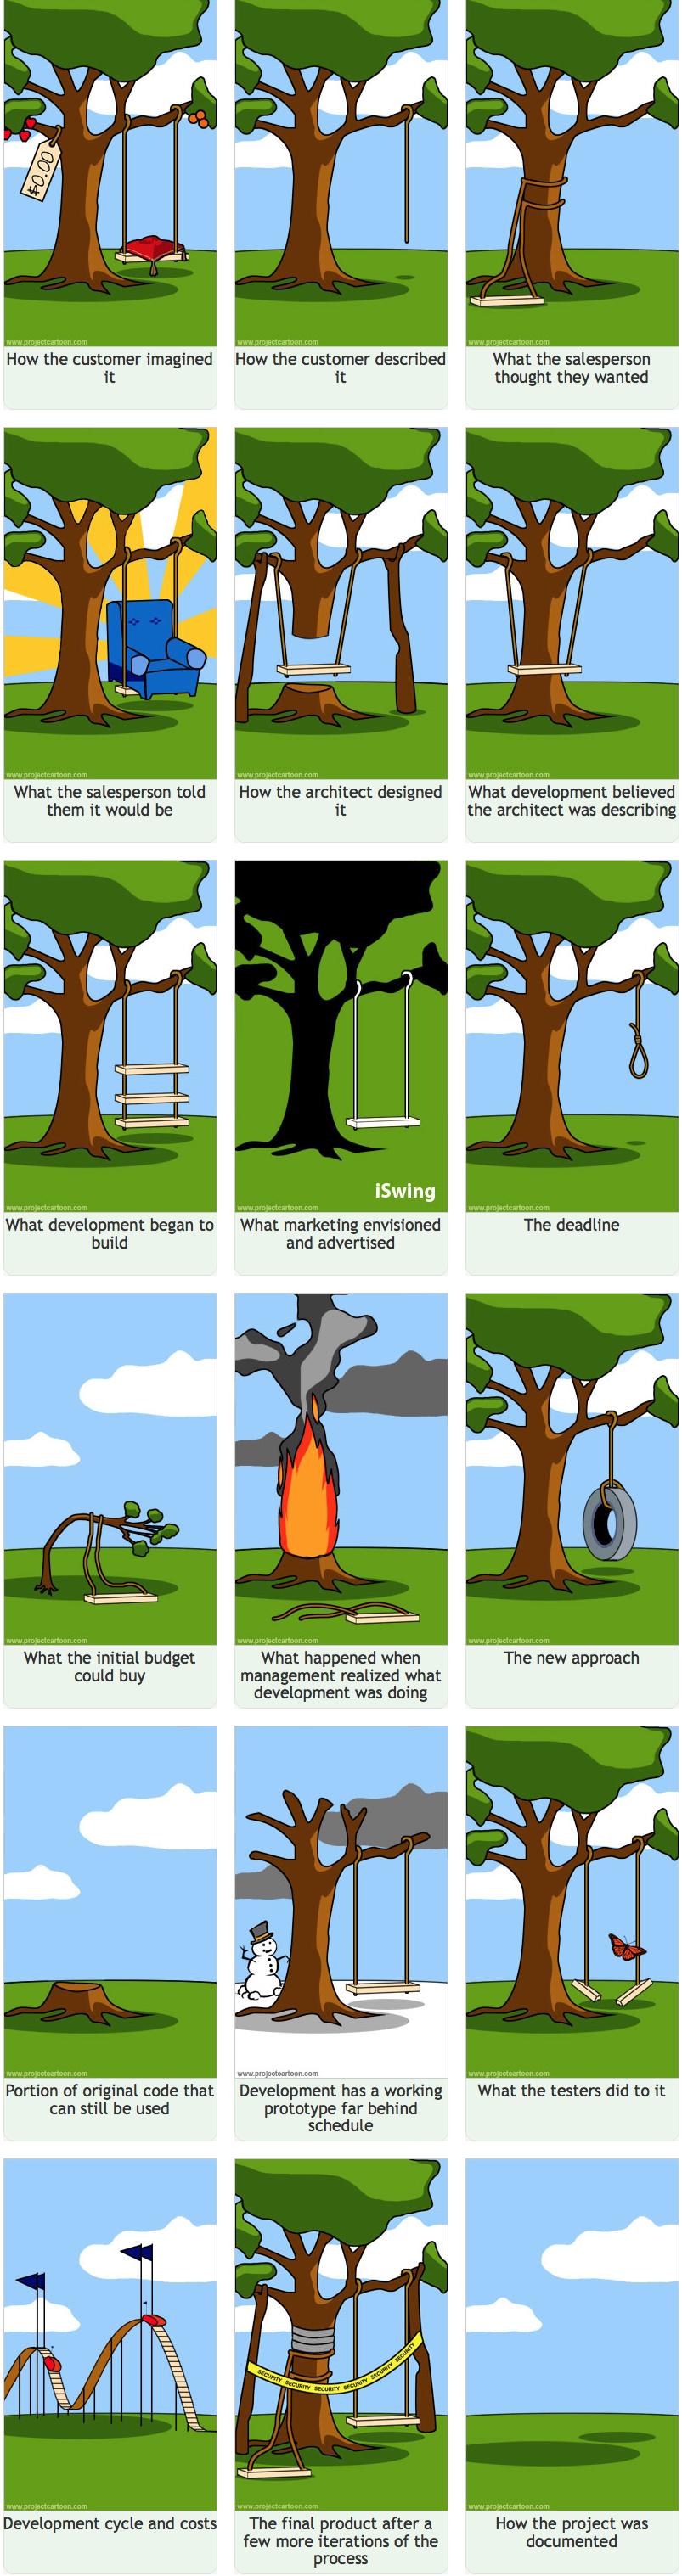 Updated Software Development Cartoon, a classic inspired